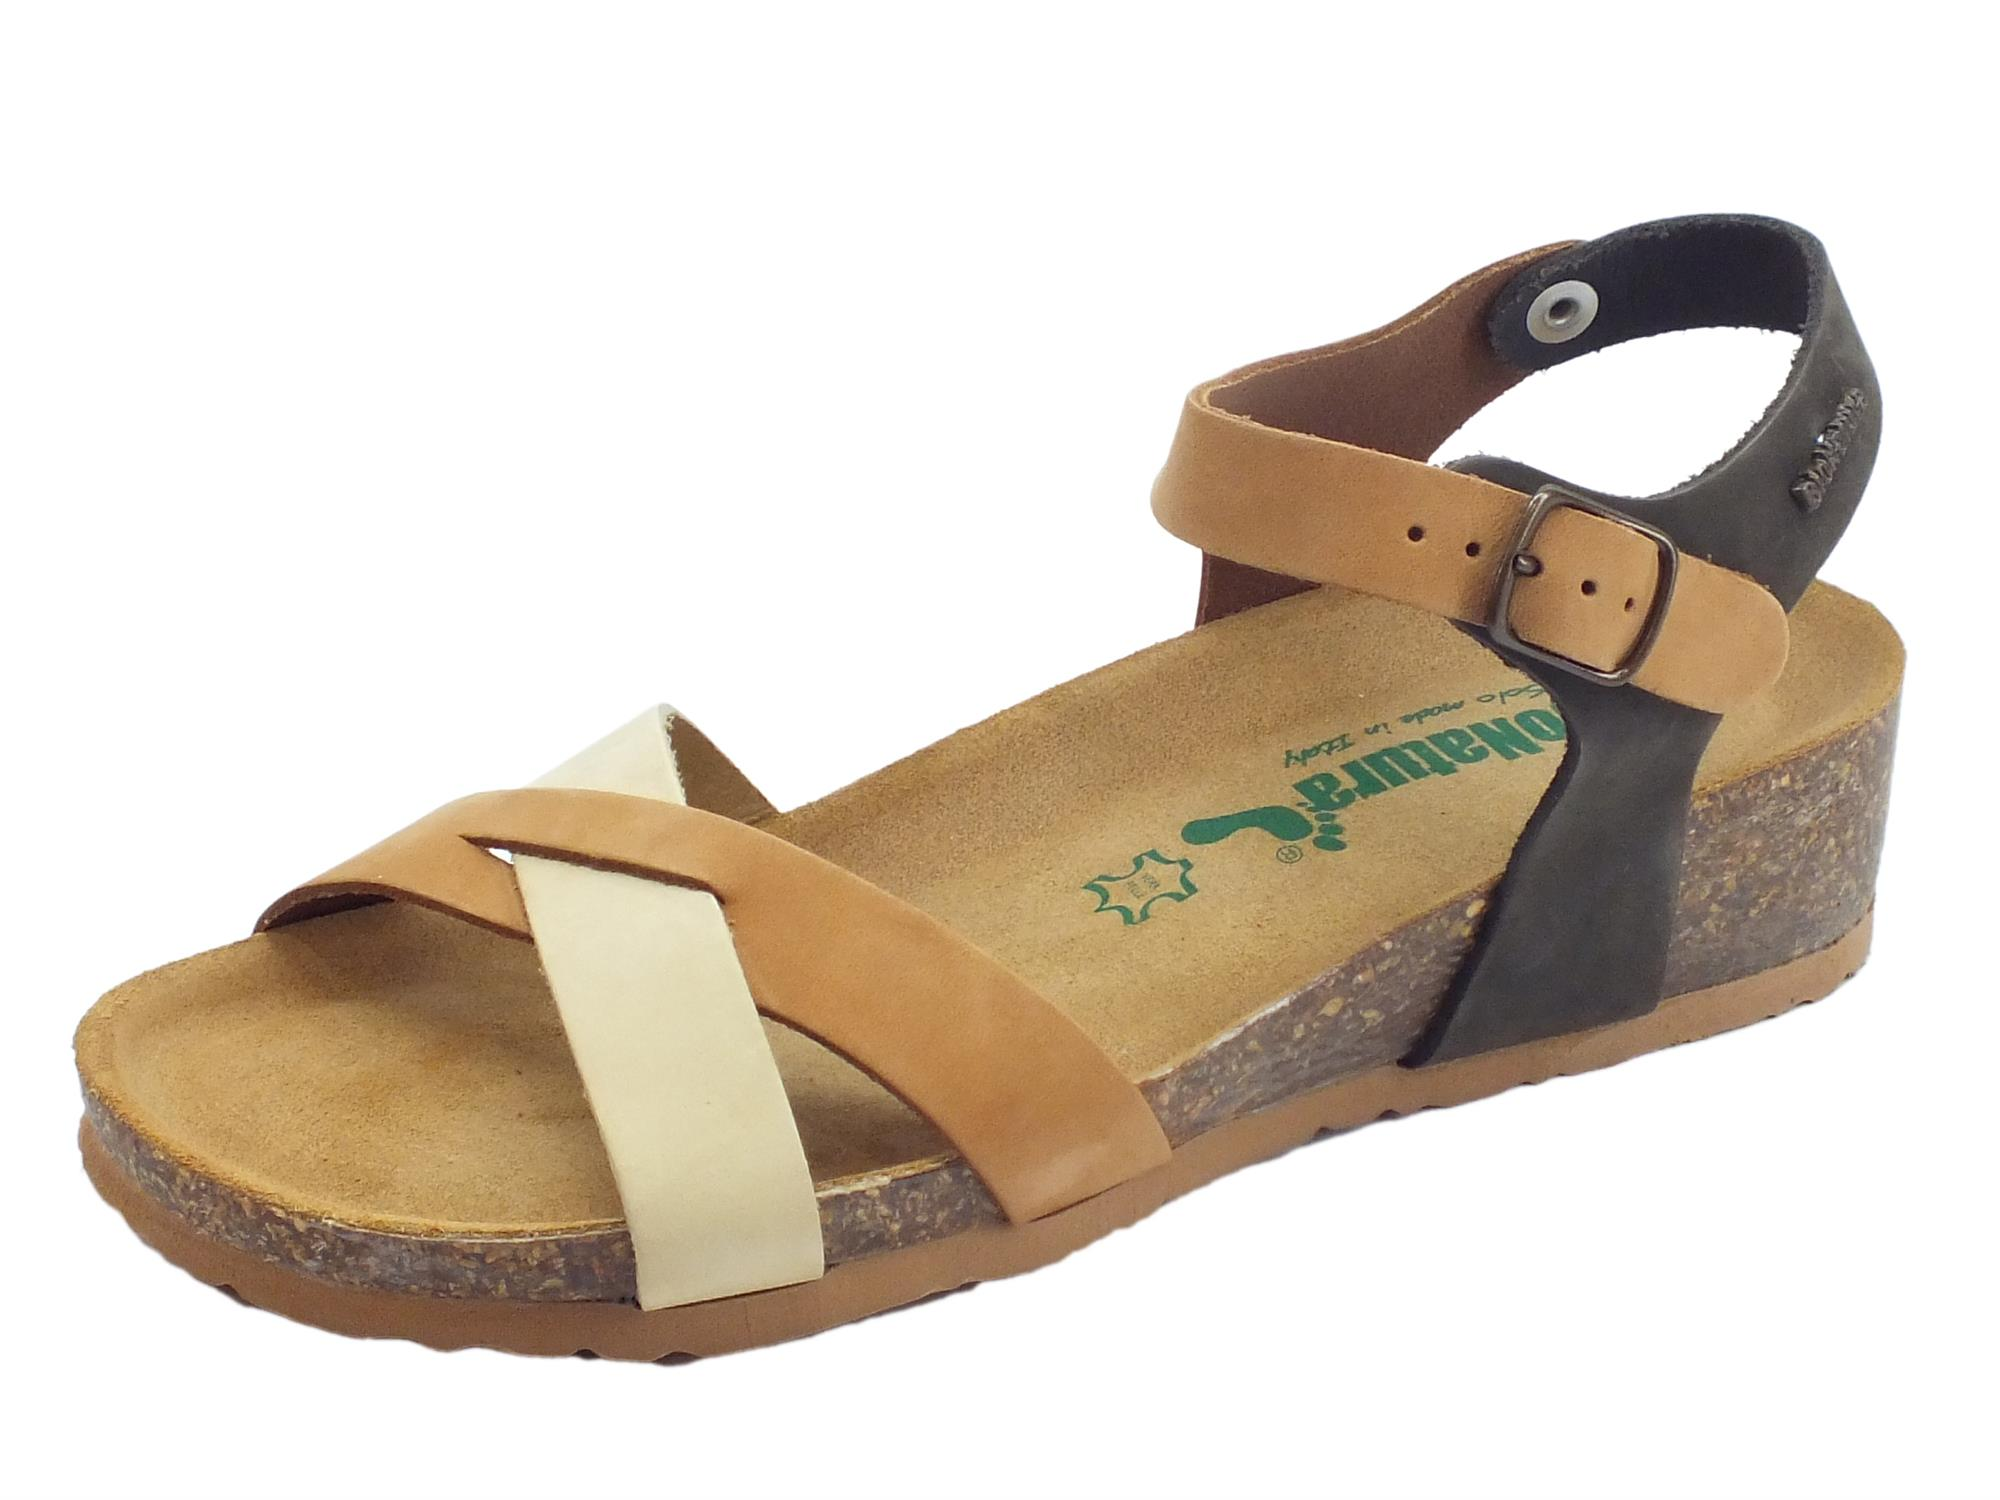 differently 43d02 a9cdf BioNatura 12 Fregene IMB Nabuk Multi Cogn sandali zeppa bassa con fibbietta